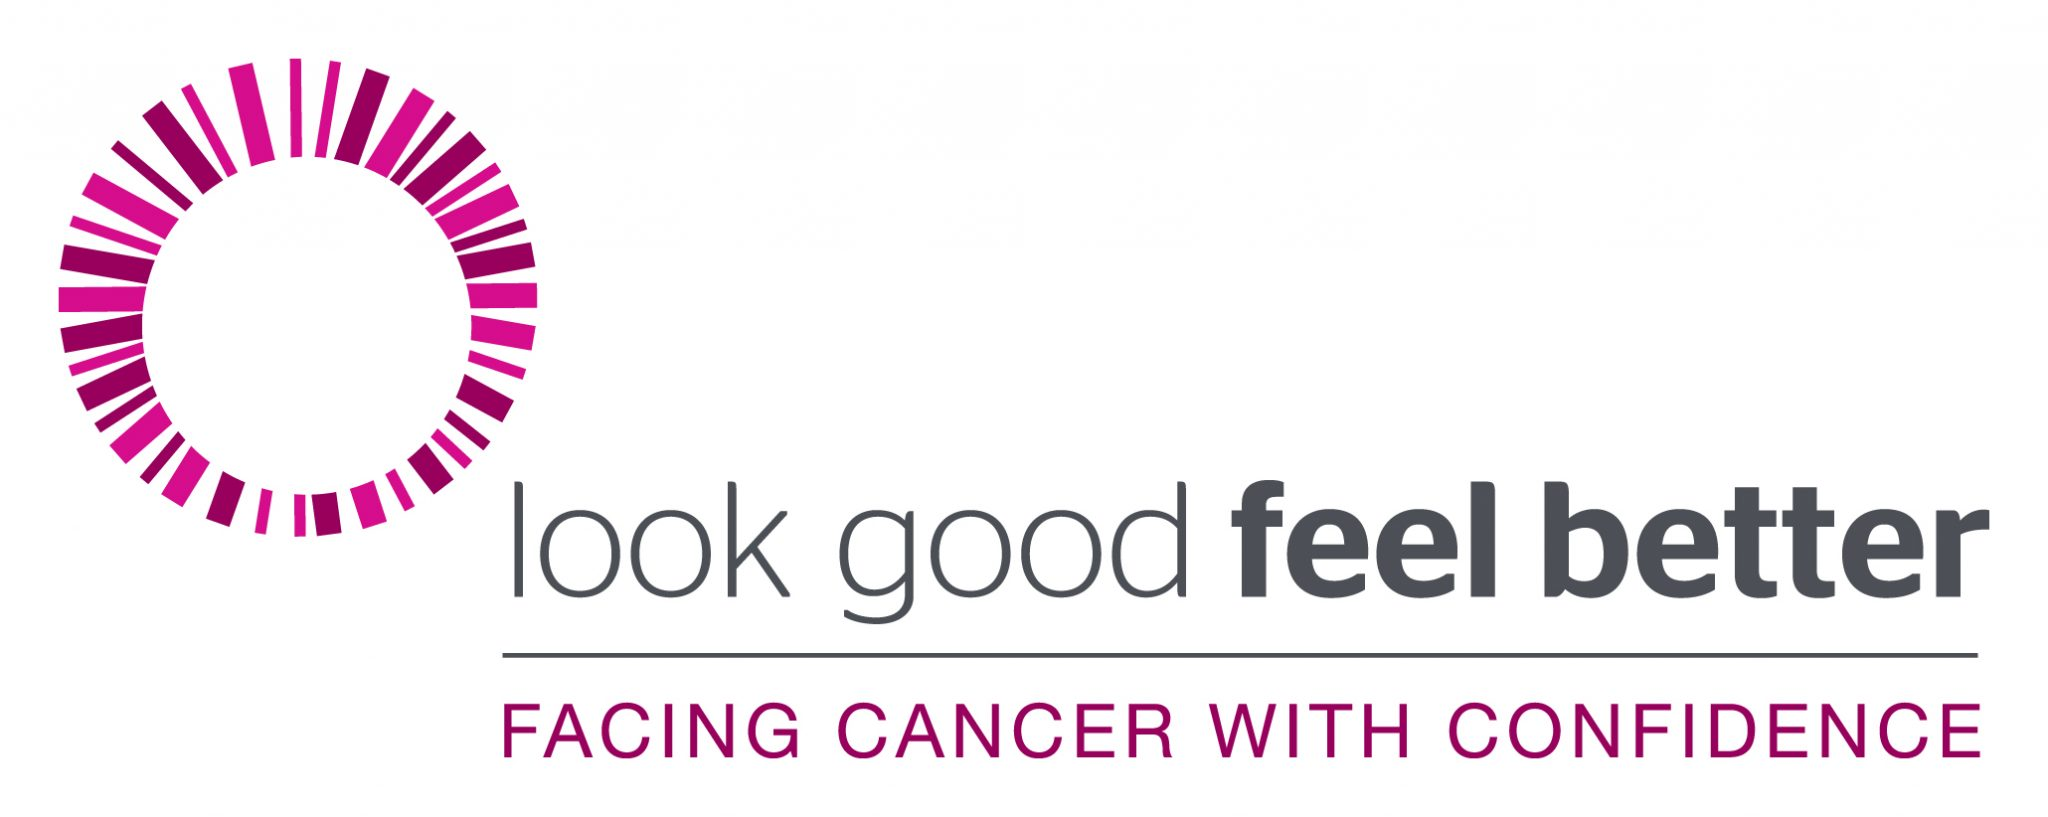 LGFB_Logo-FCWC-long-1